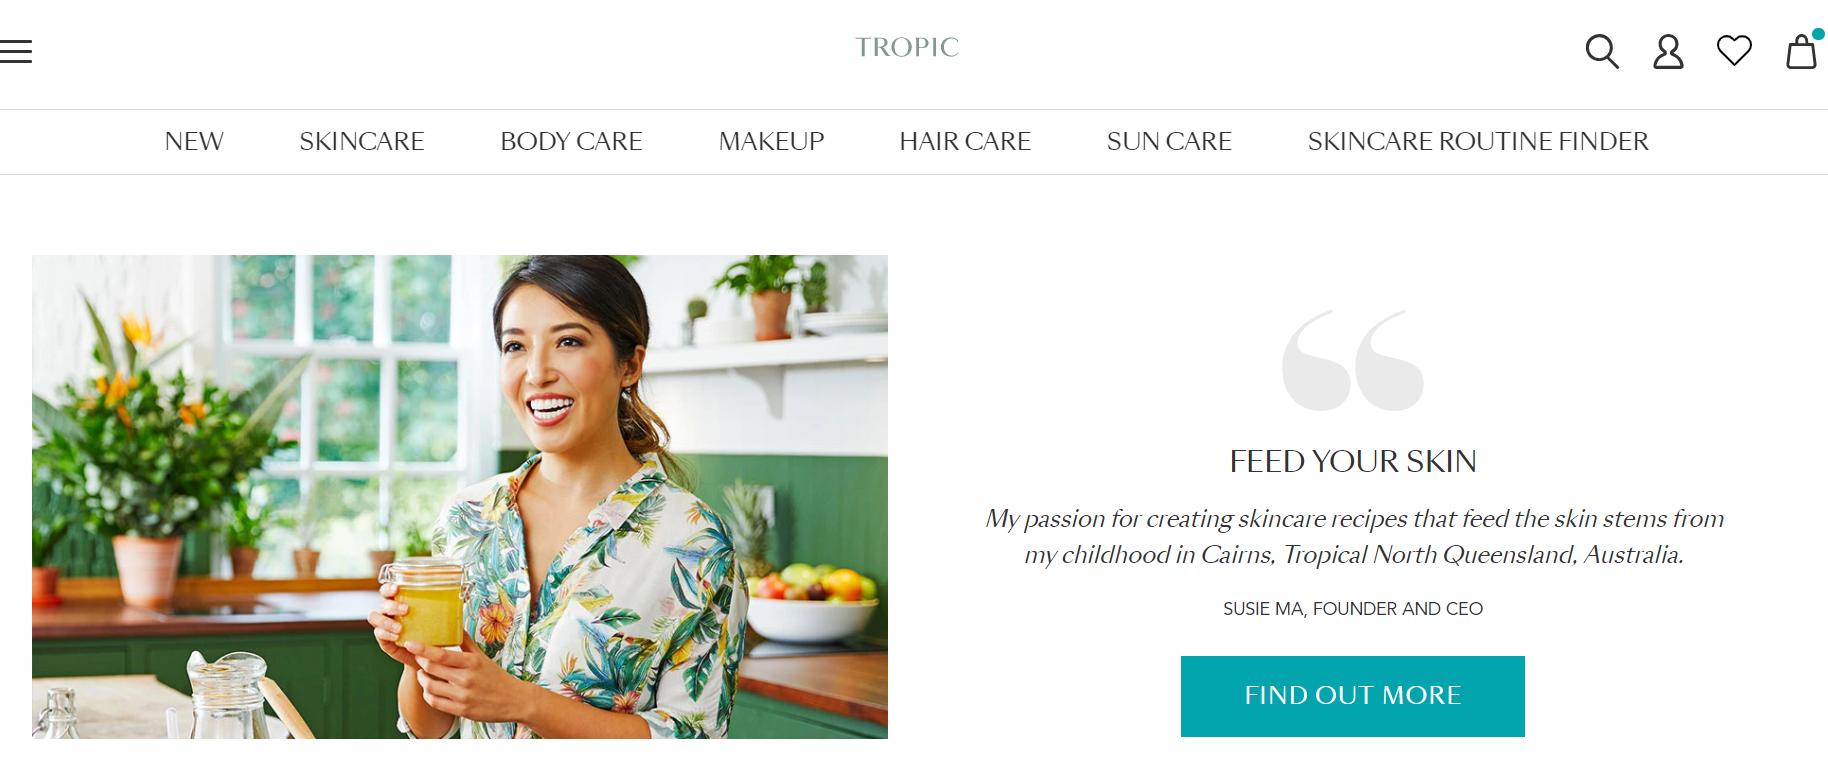 Tropic Skincare